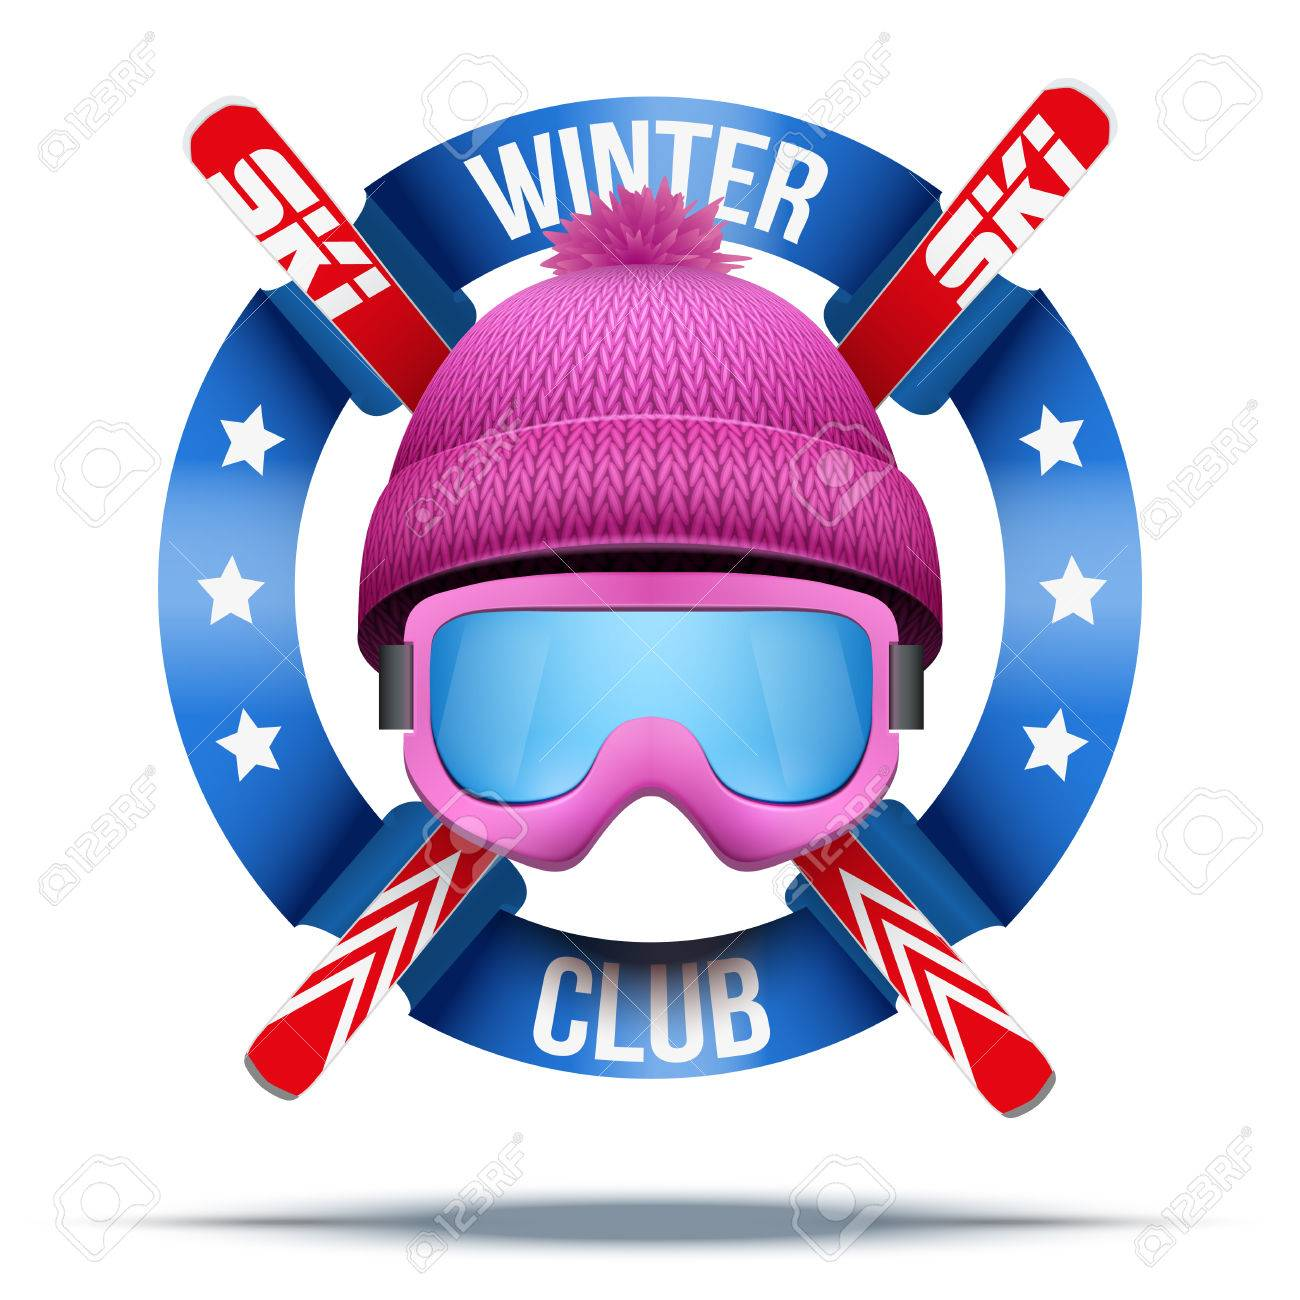 62f060dac8b5 Ski club or team. Symbols of winter woolen hat and ski with ribbon. Vector